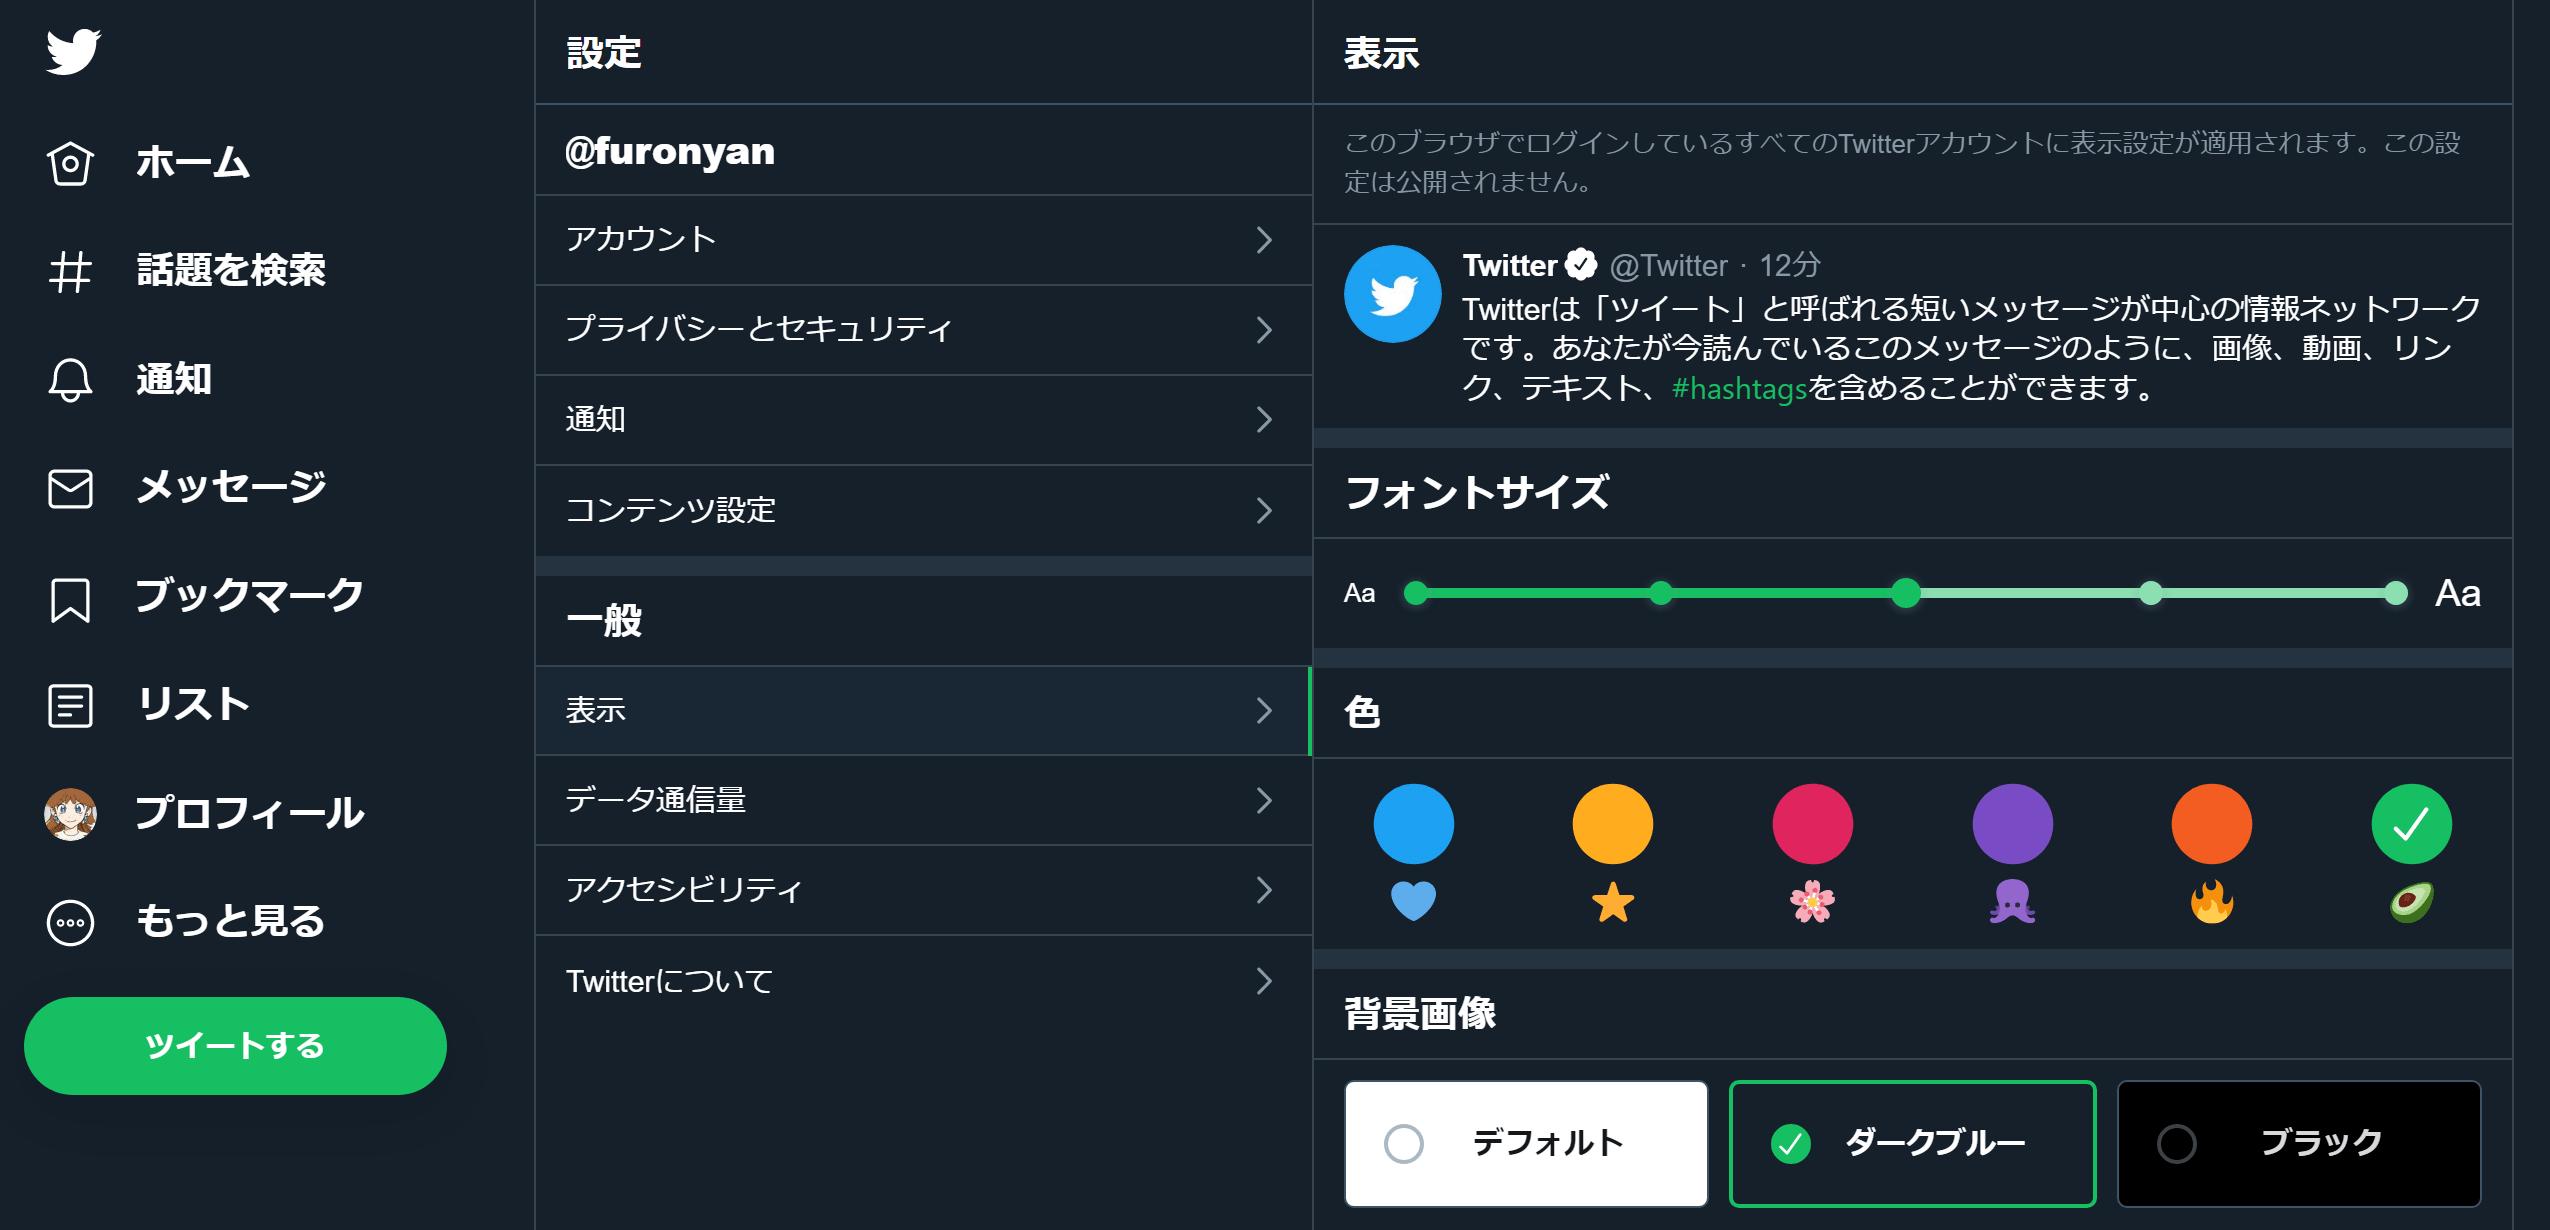 Twitterの背景色表示設定、ダークブルー背景モード